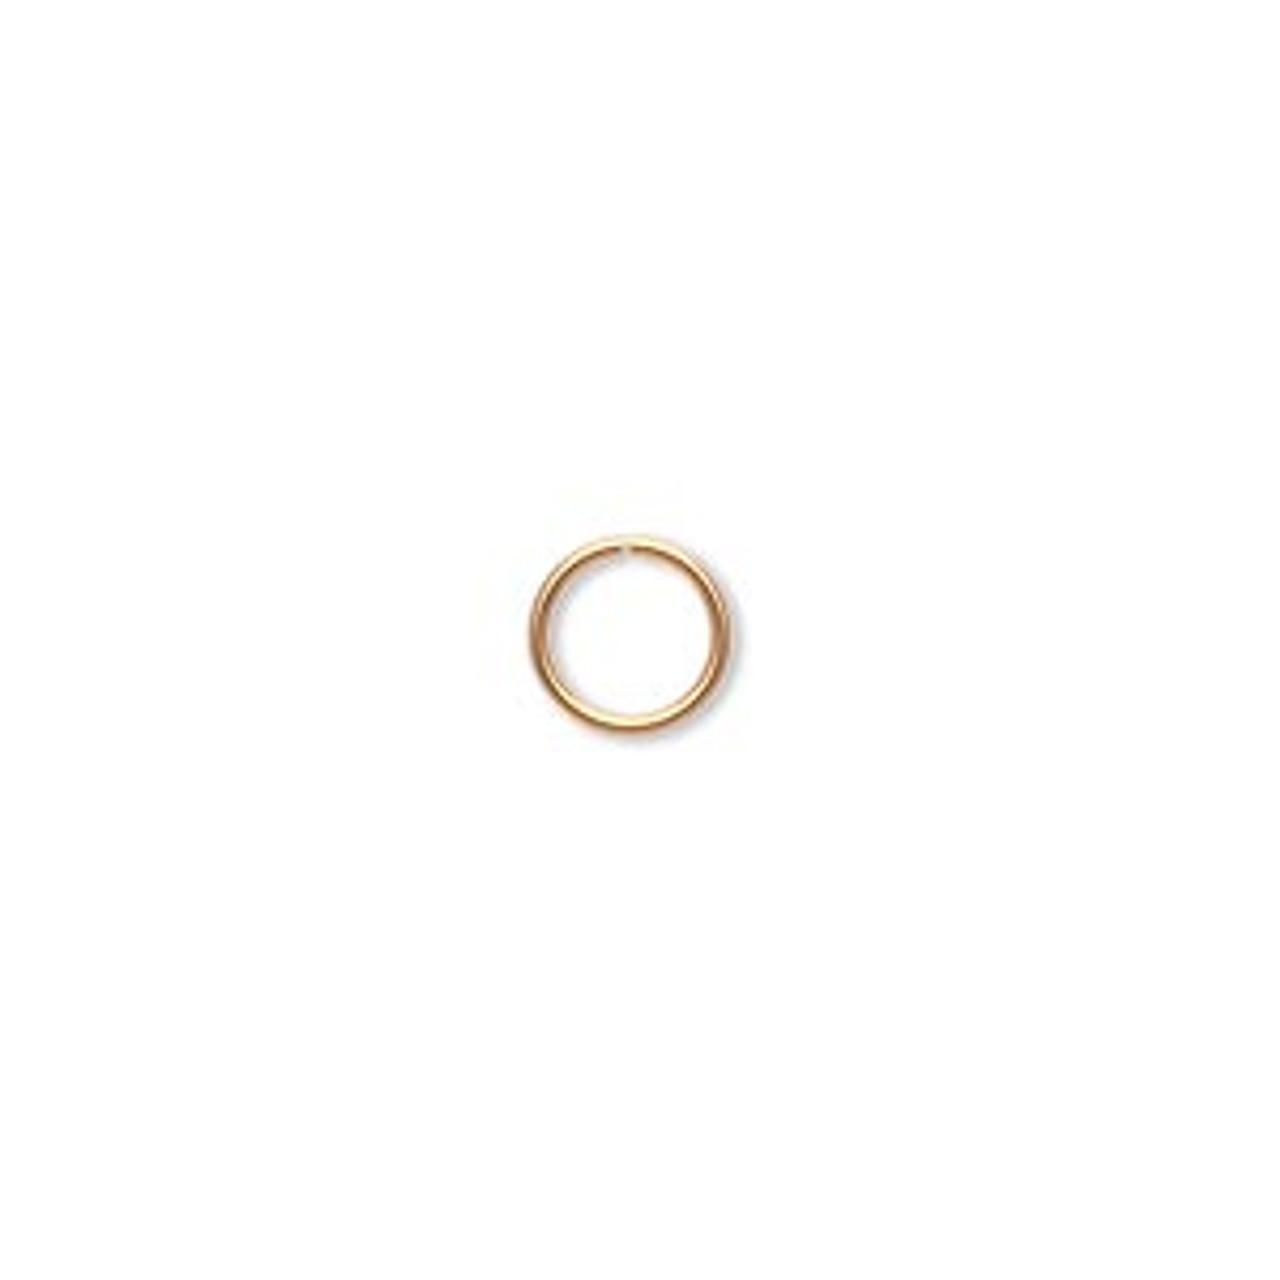 20ga. 7mm Gold Plated Jump Rings (100 Ct.)